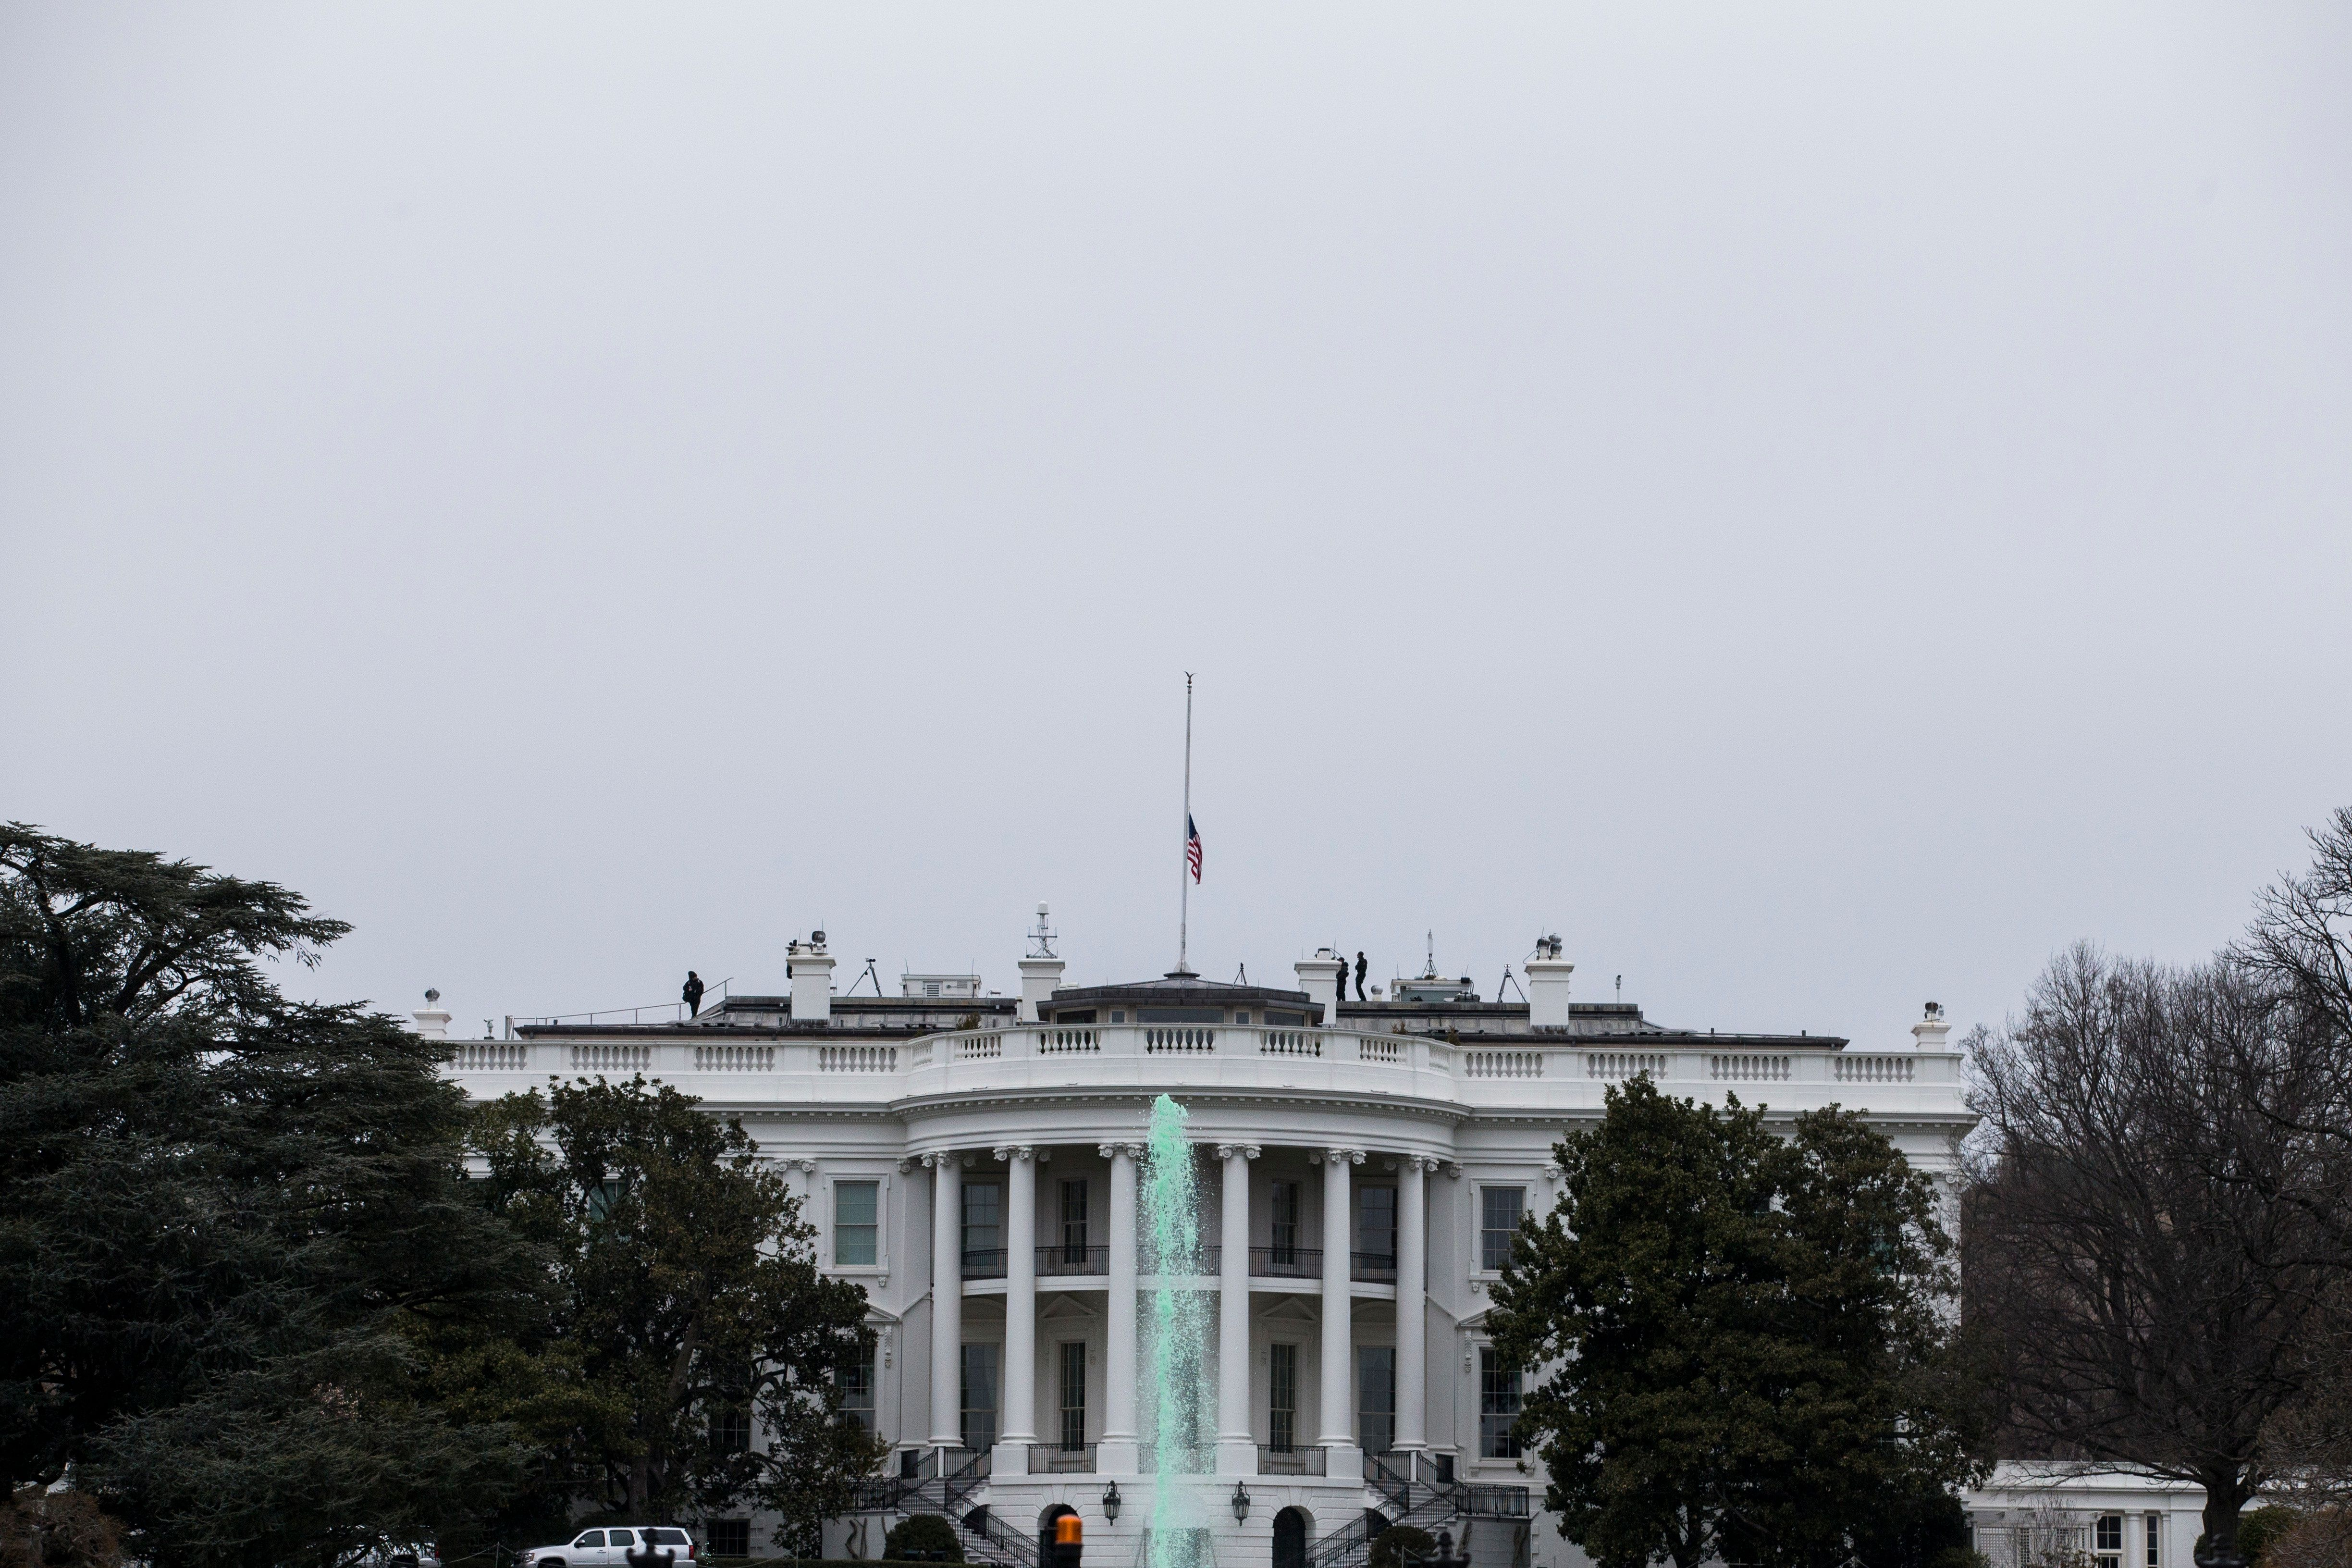 Washington Post: Εργαζόμενοι στον Λευκό Οίκο αναγκάστηκαν να υπογράψουν συμφωνίες